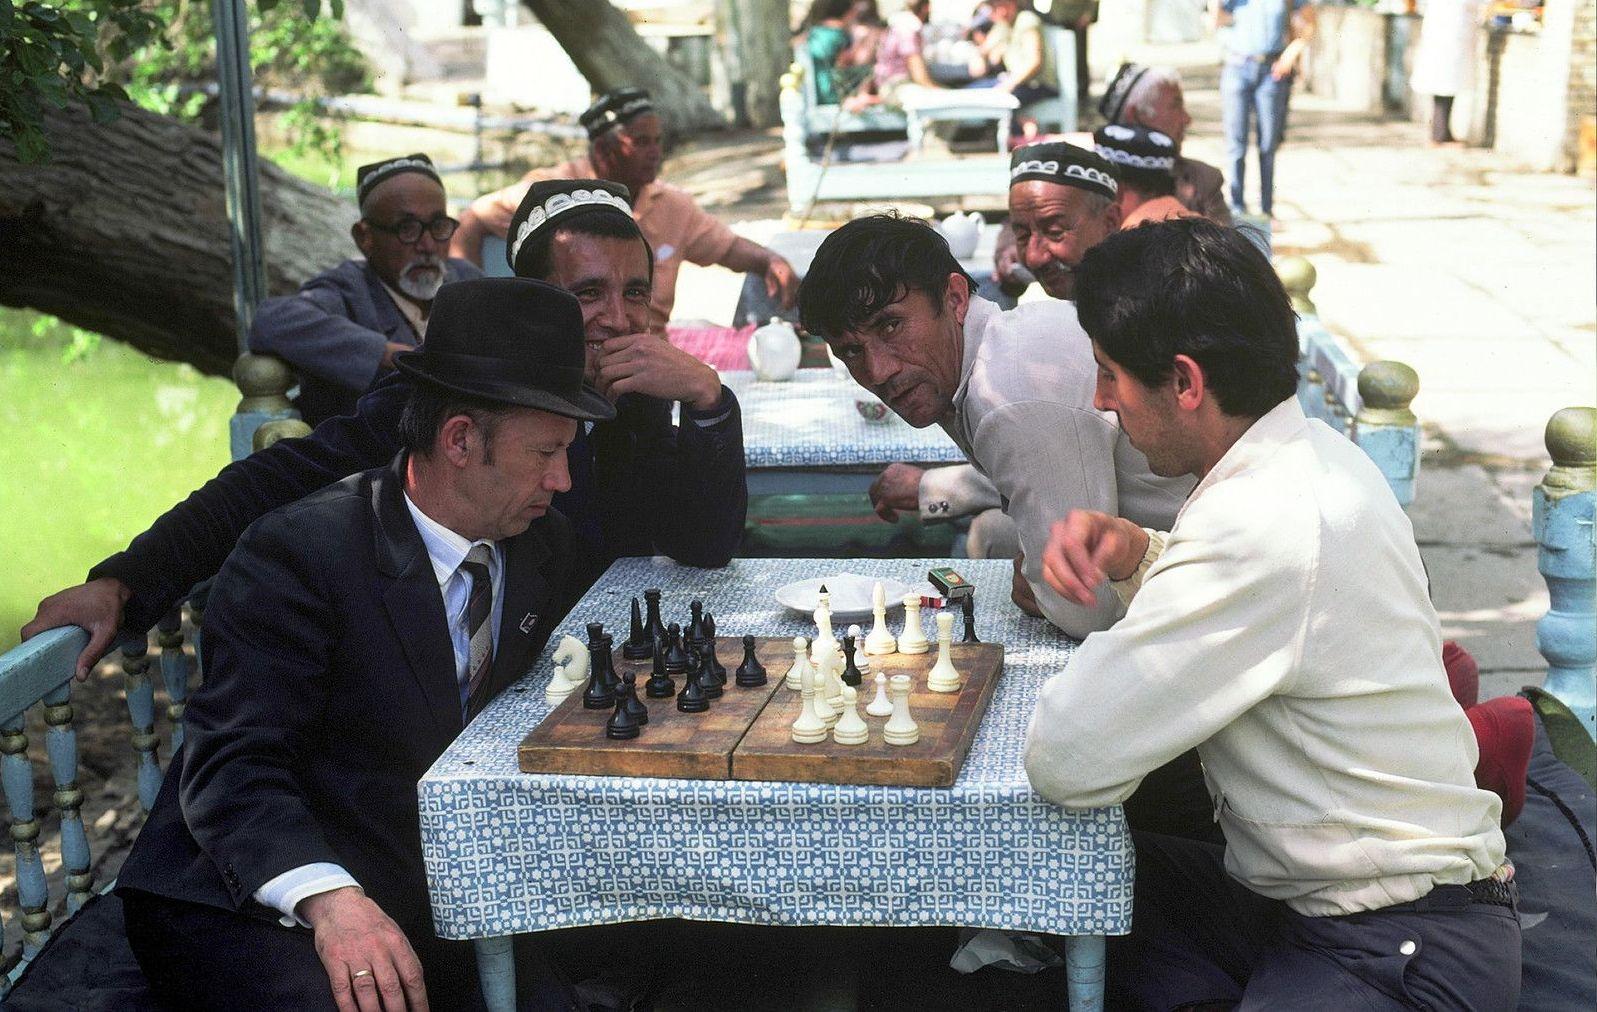 Самарканд. Шахматы в парке